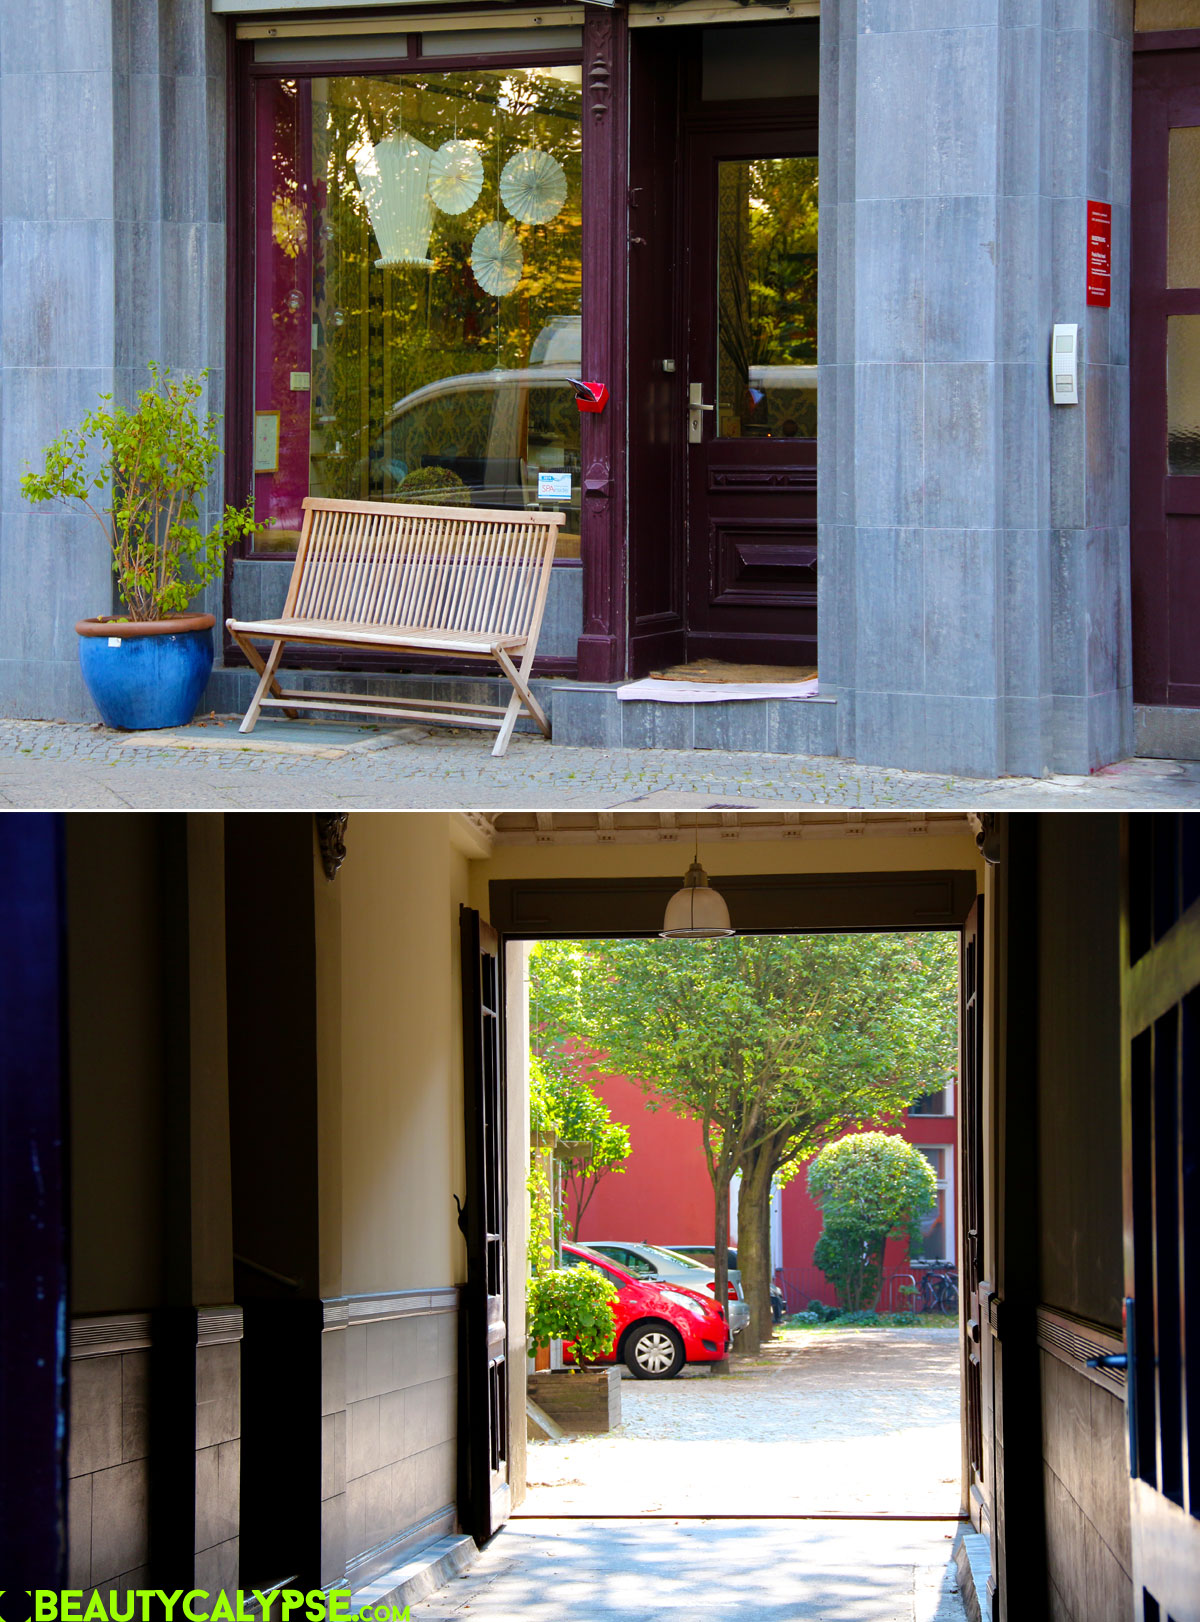 berlin s green spas 2 le petit spa living ethical excellence the quest est 2012. Black Bedroom Furniture Sets. Home Design Ideas